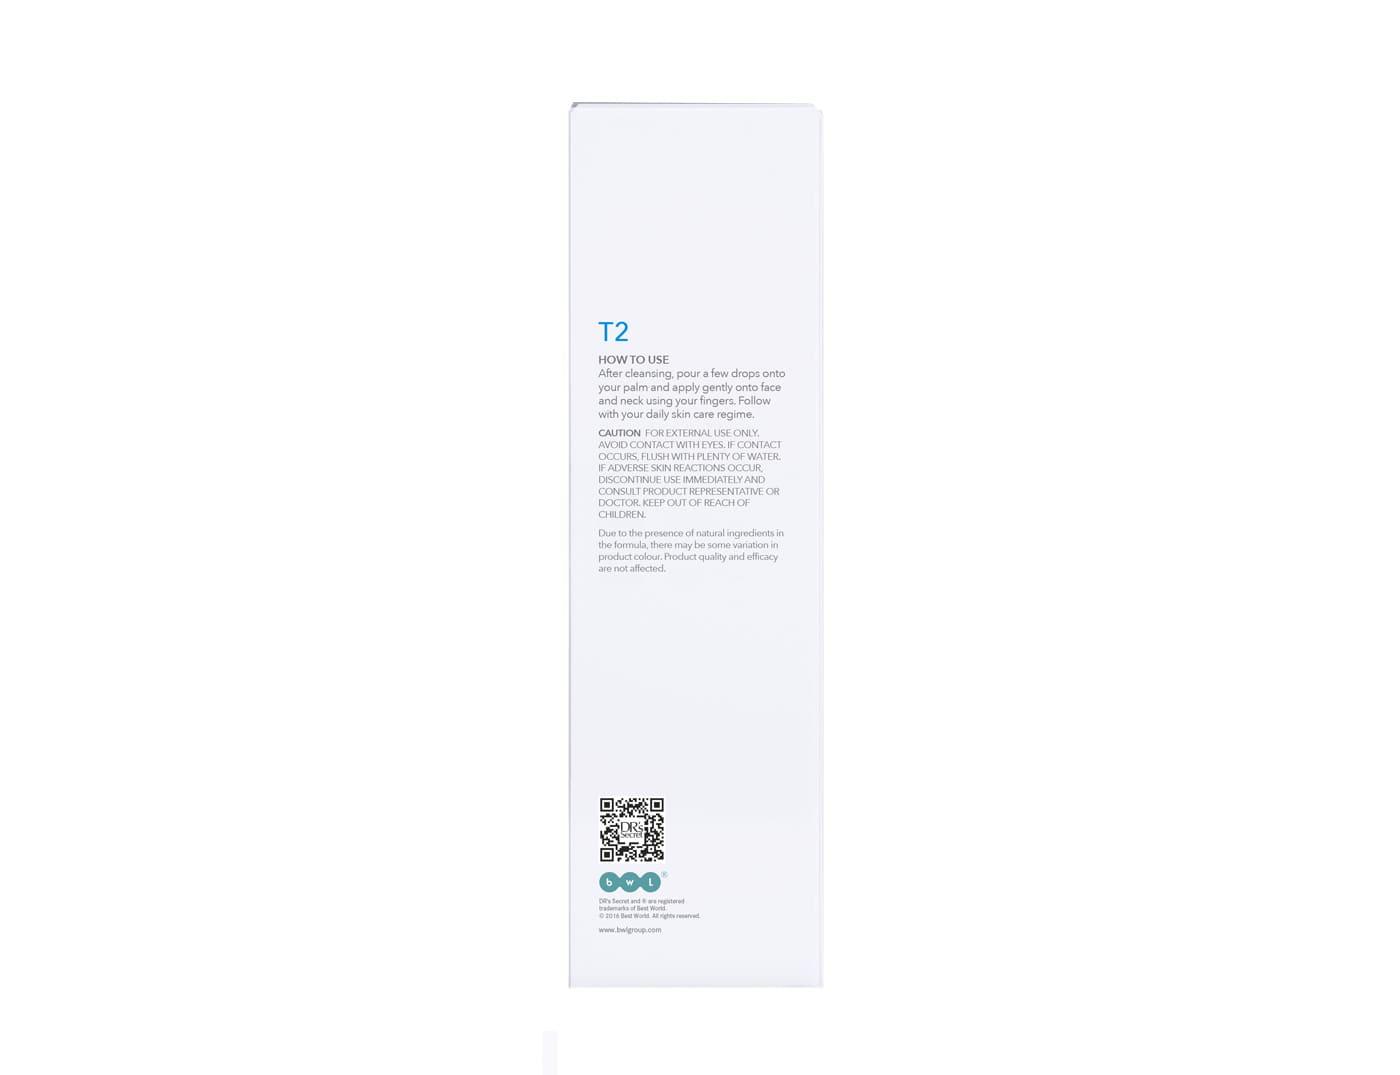 DR's Secret Toner T2 box back packaging